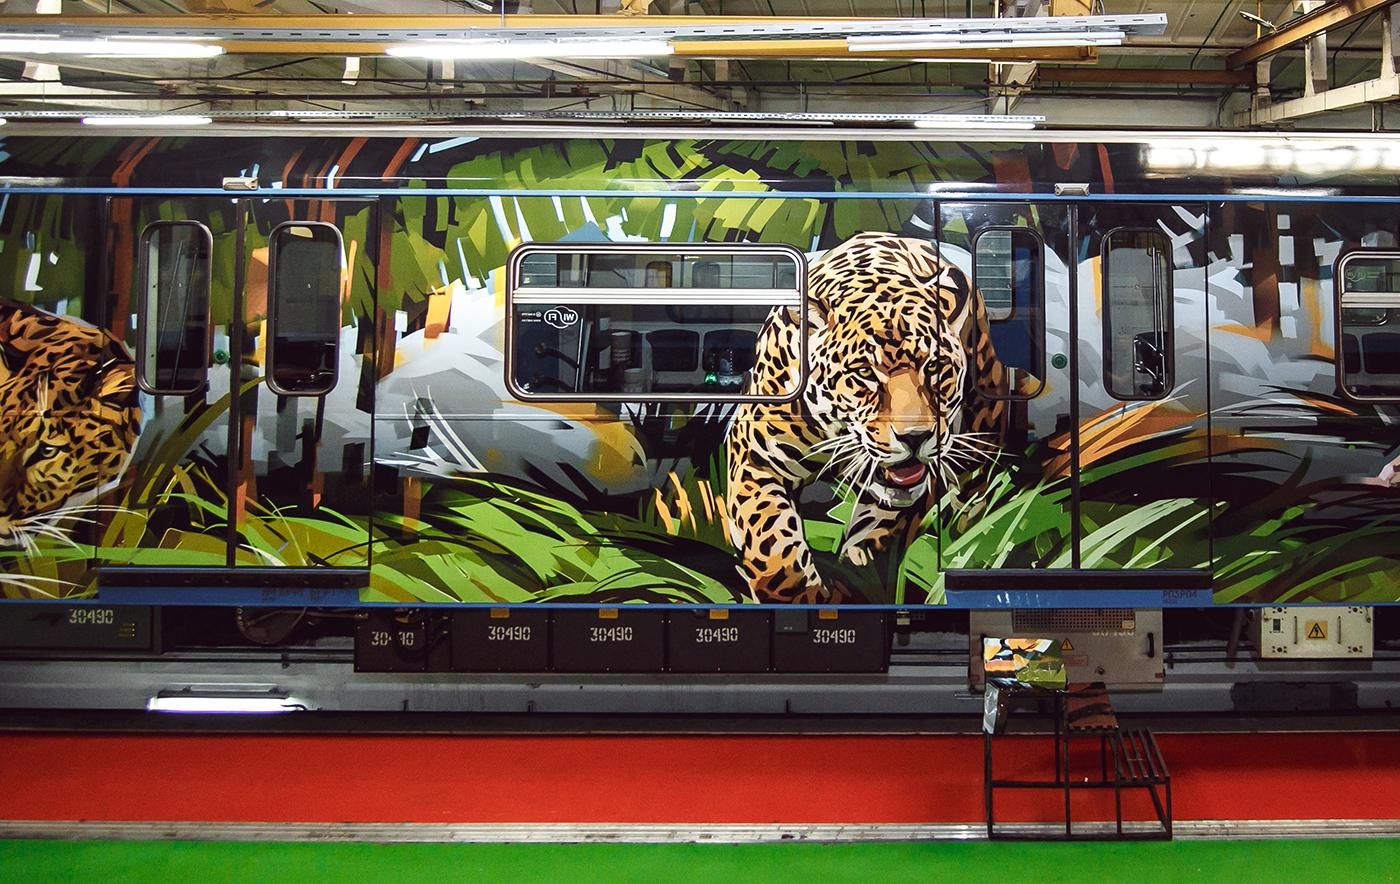 Big cats in subway 11